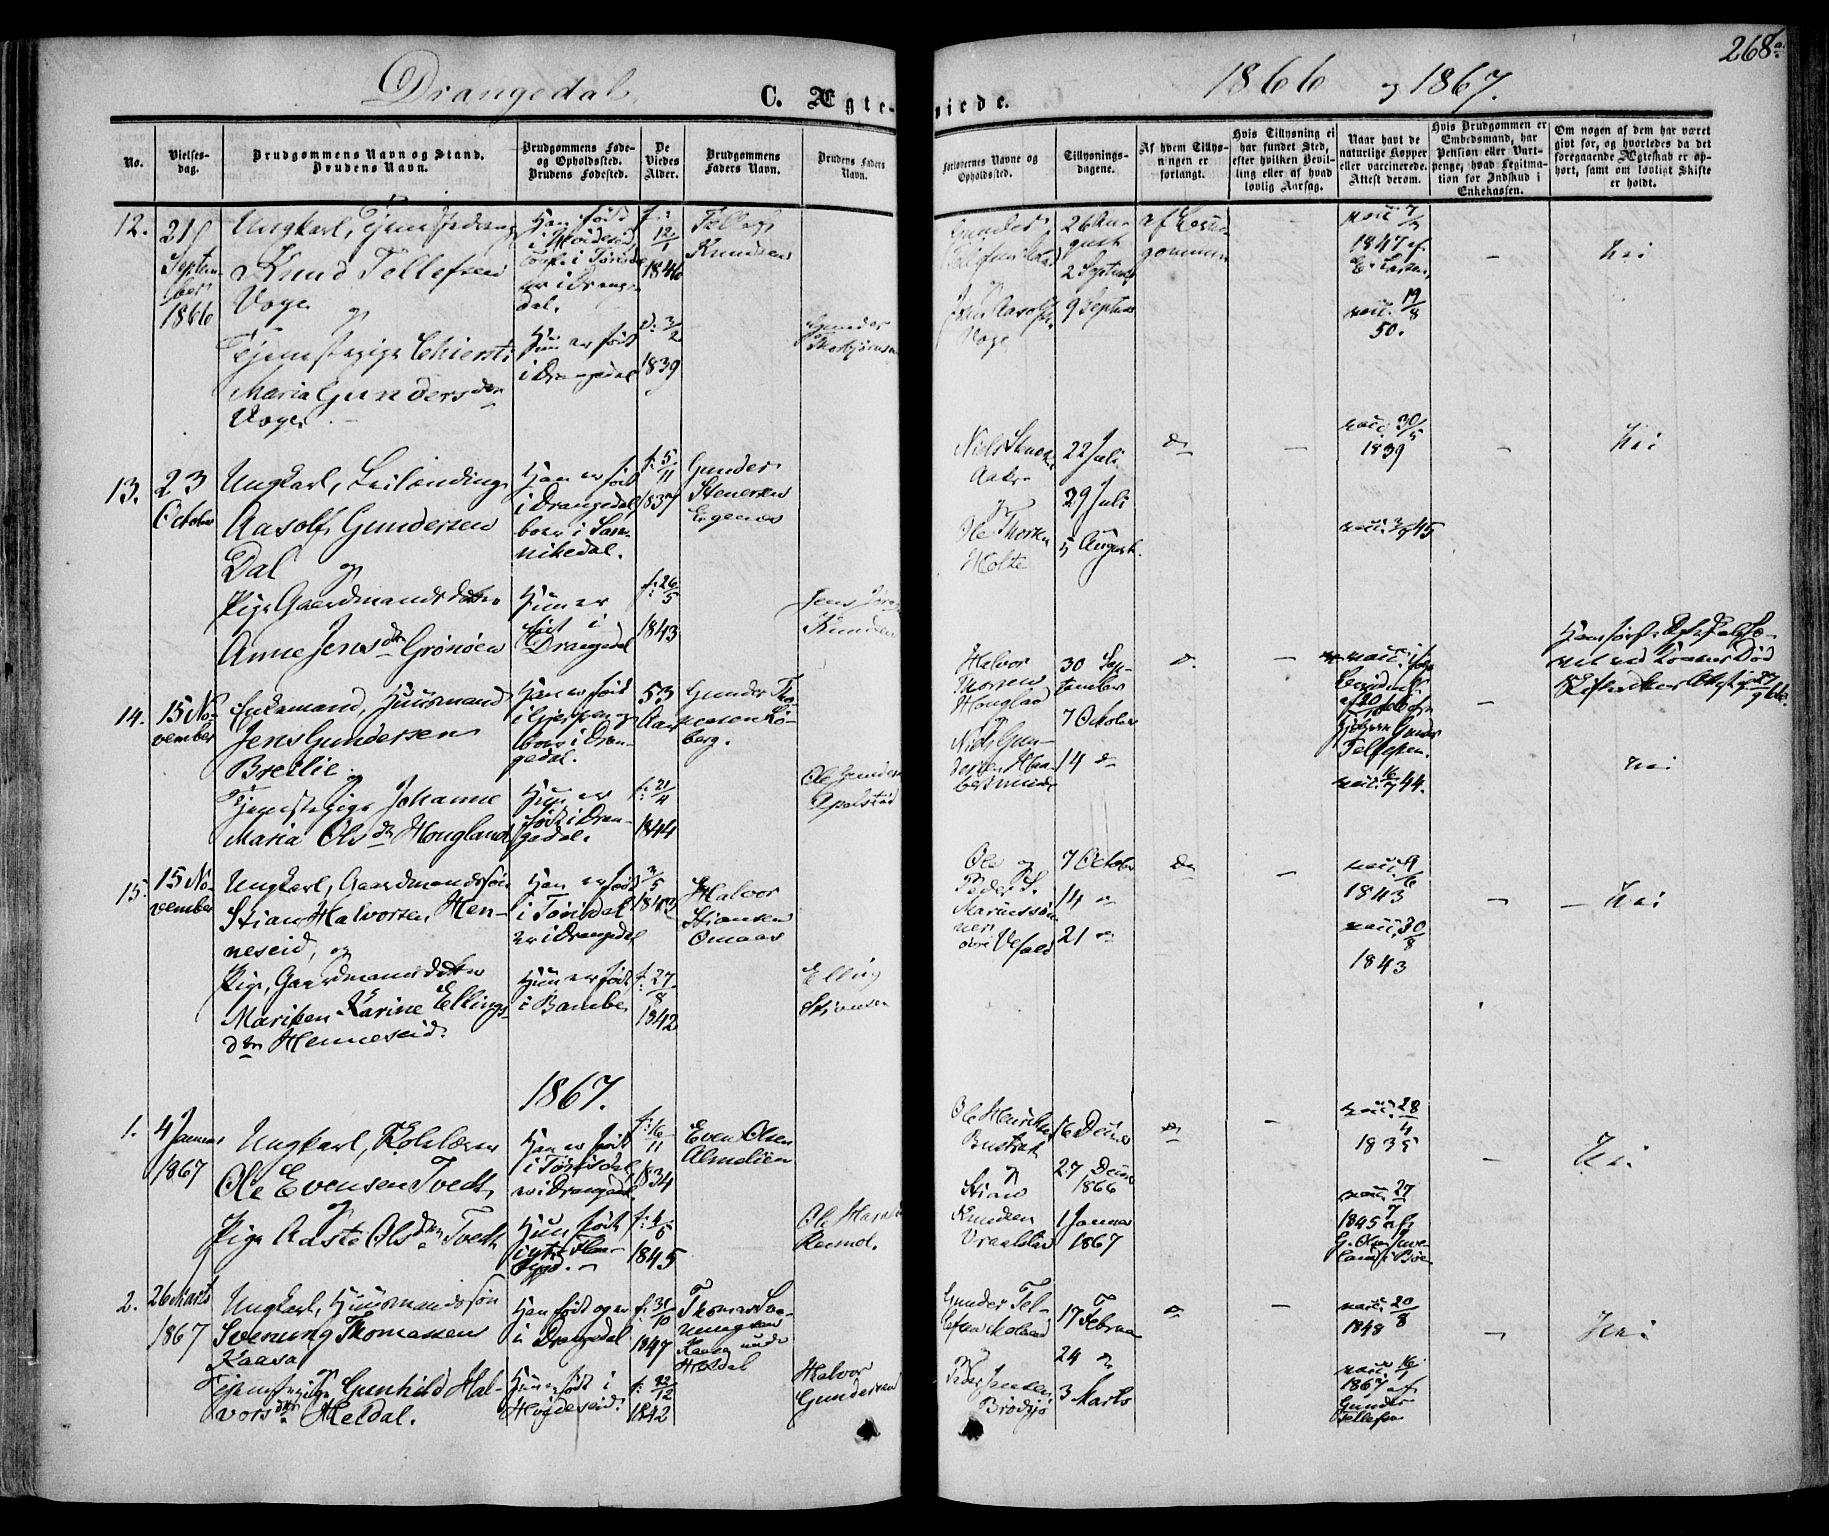 SAKO, Drangedal kirkebøker, F/Fa/L0008: Ministerialbok nr. 8, 1857-1871, s. 268